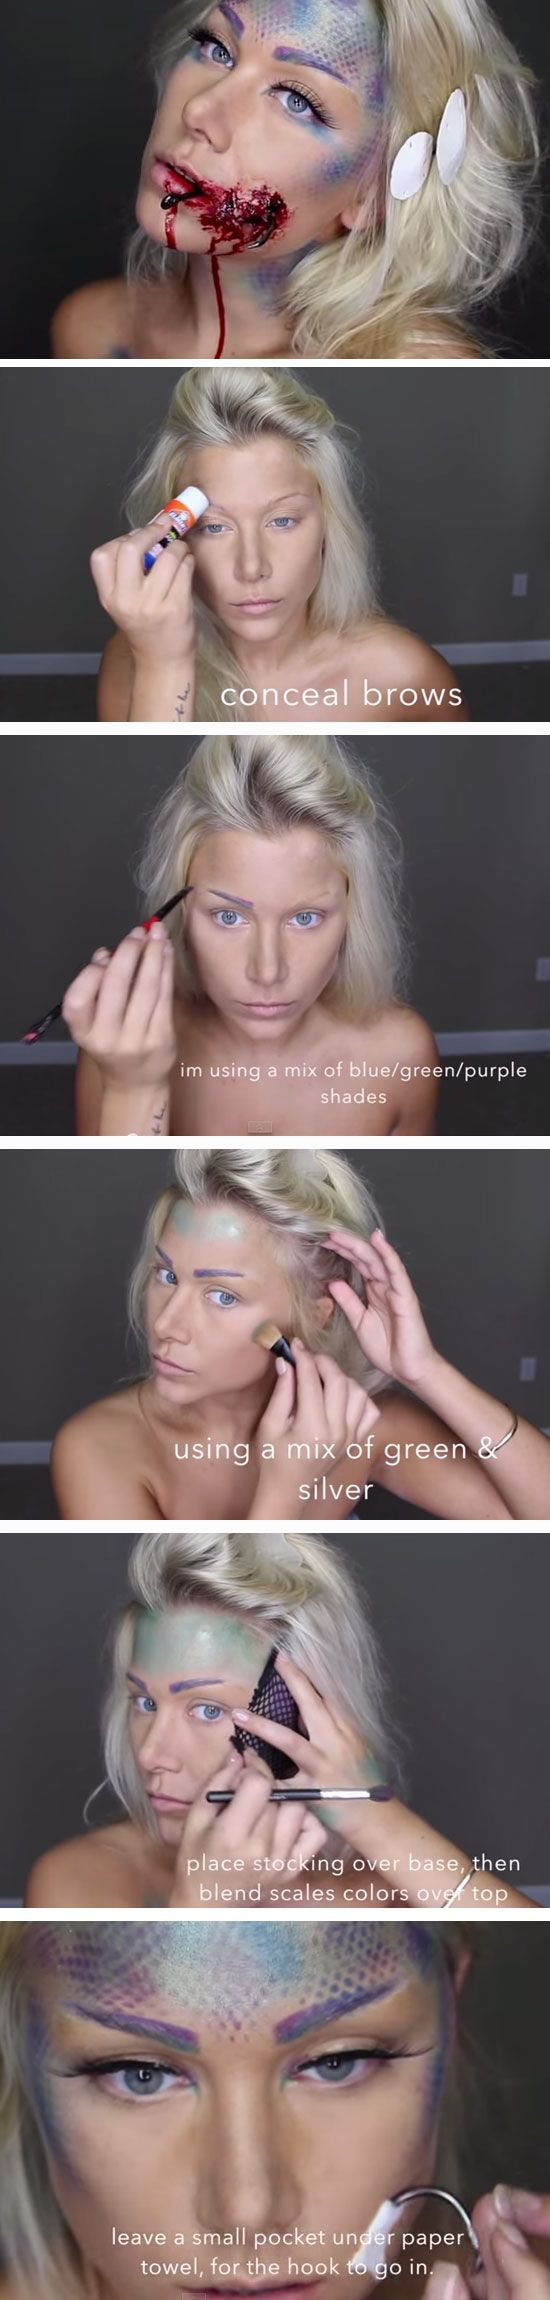 Meerjungfrau am Haken, perfekt für Halloween! #makeup